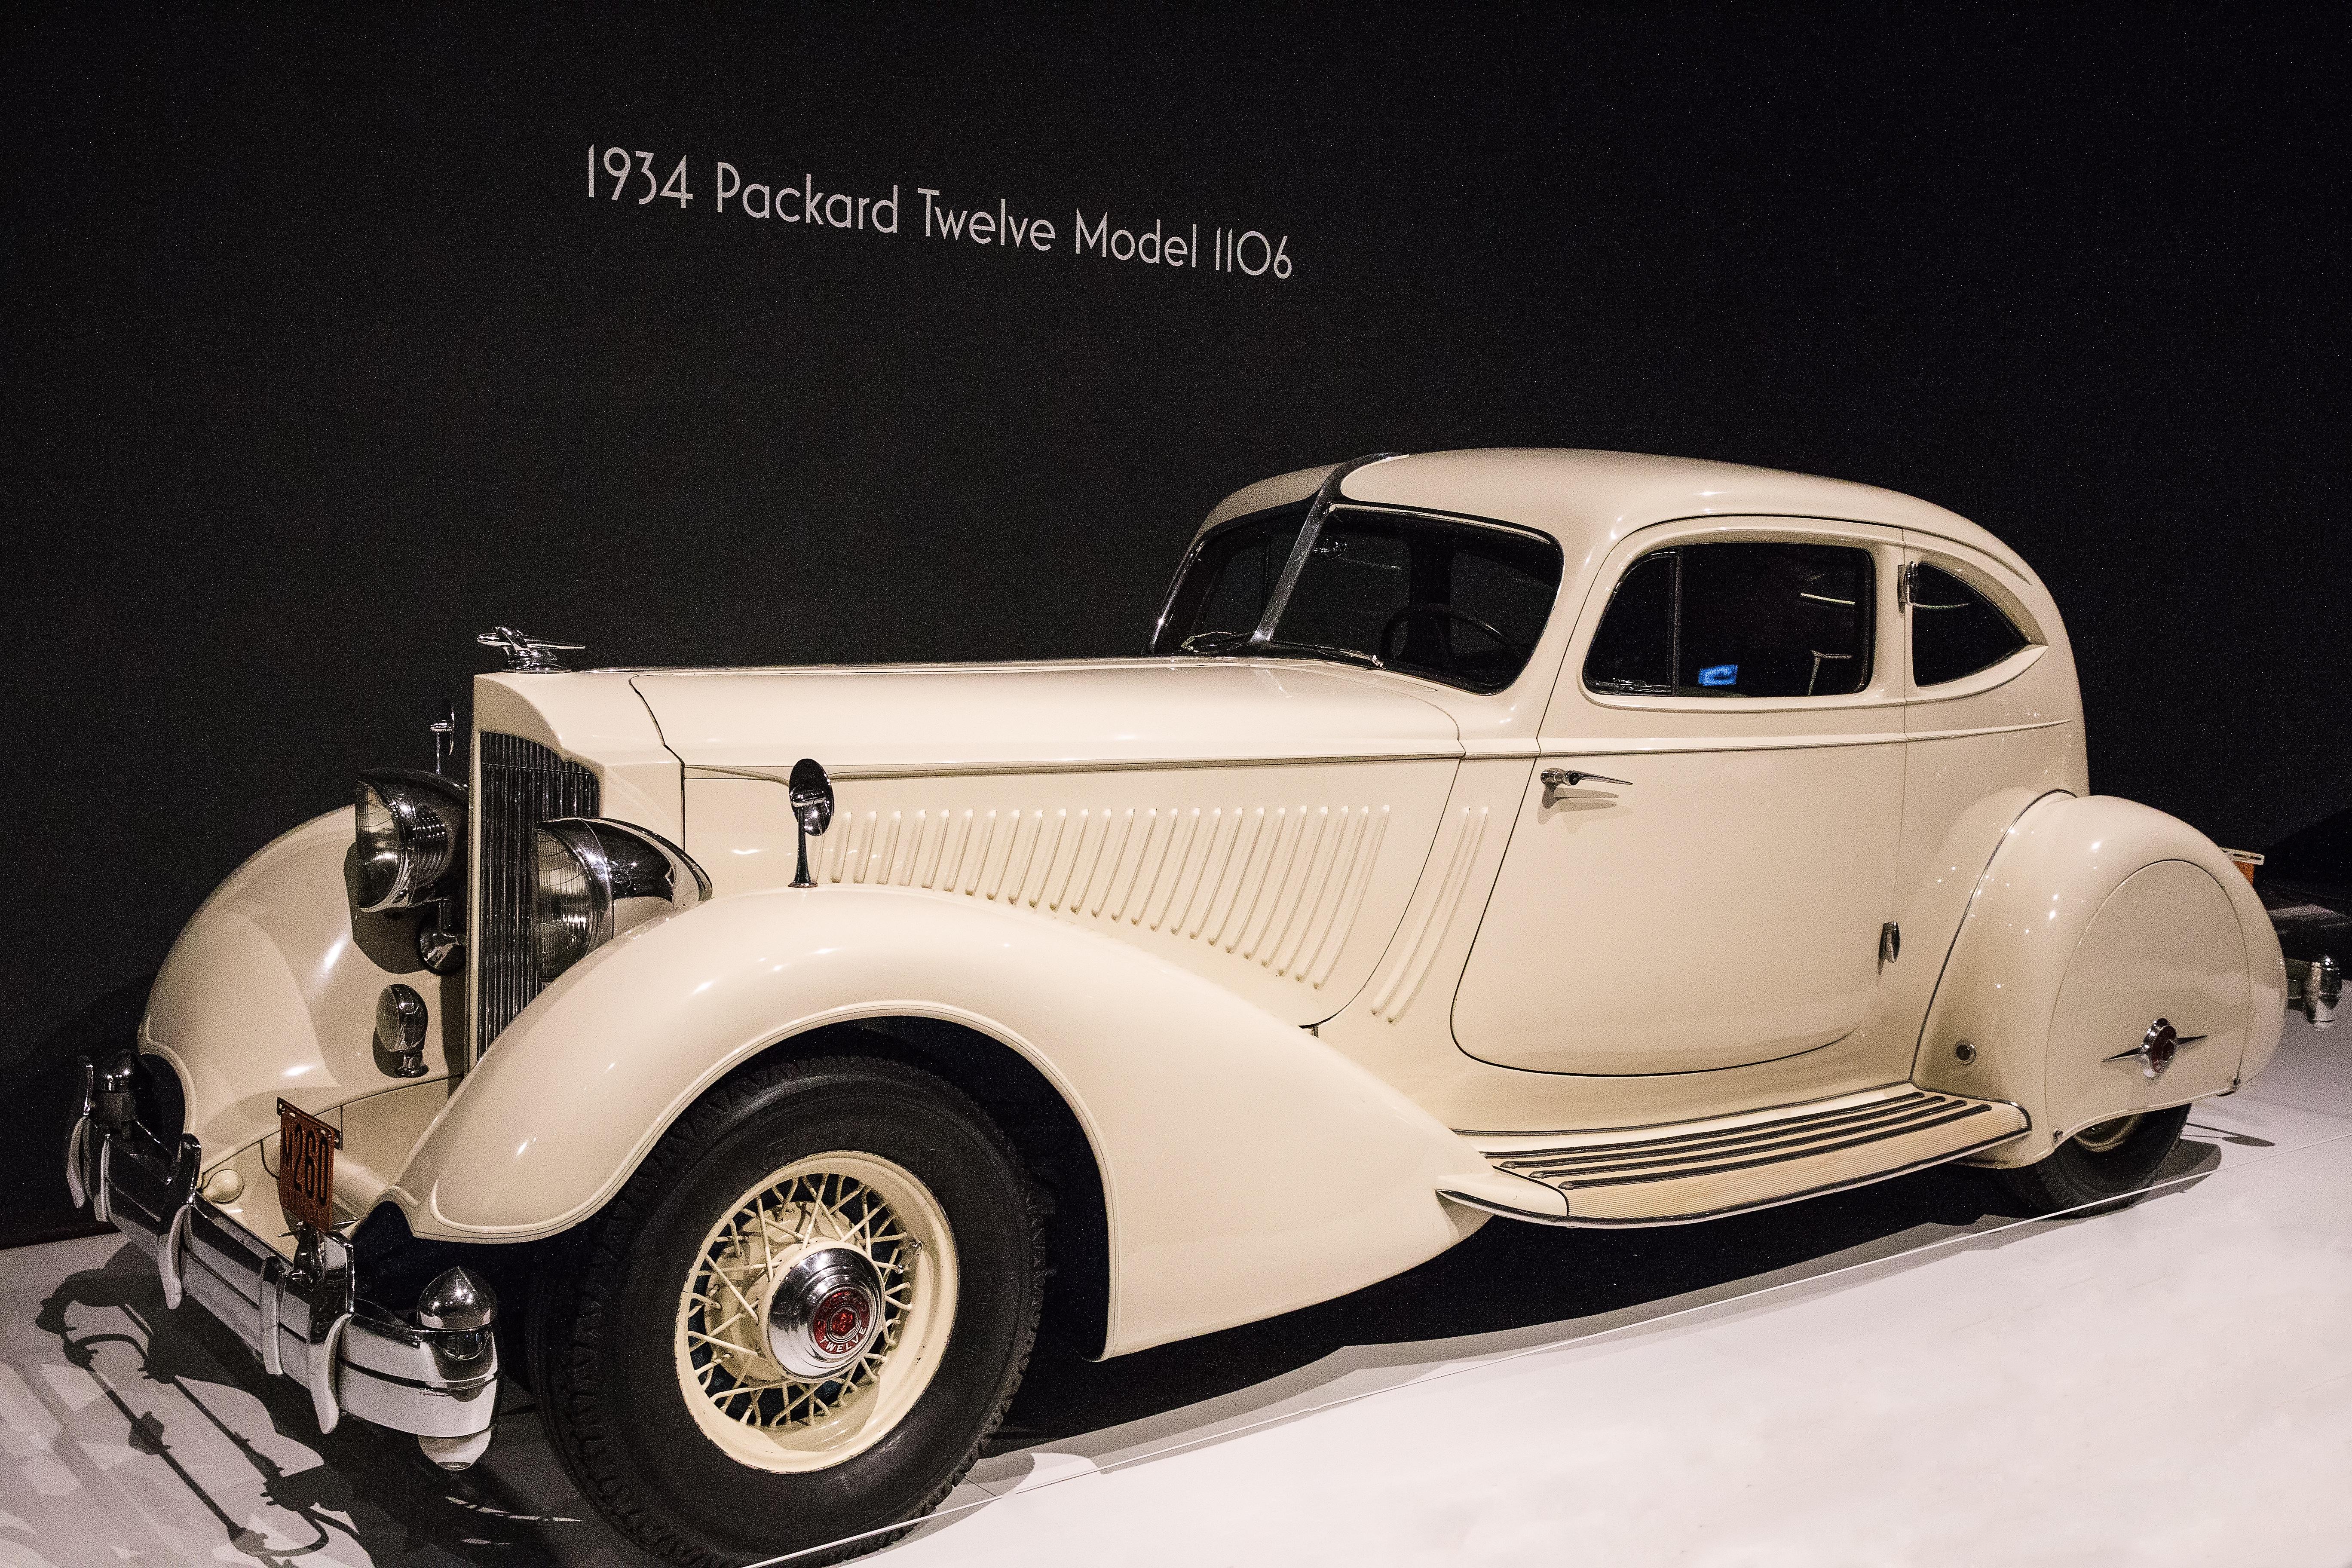 Free Images : motor vehicle, vintage car, art deco, classic, antique ...